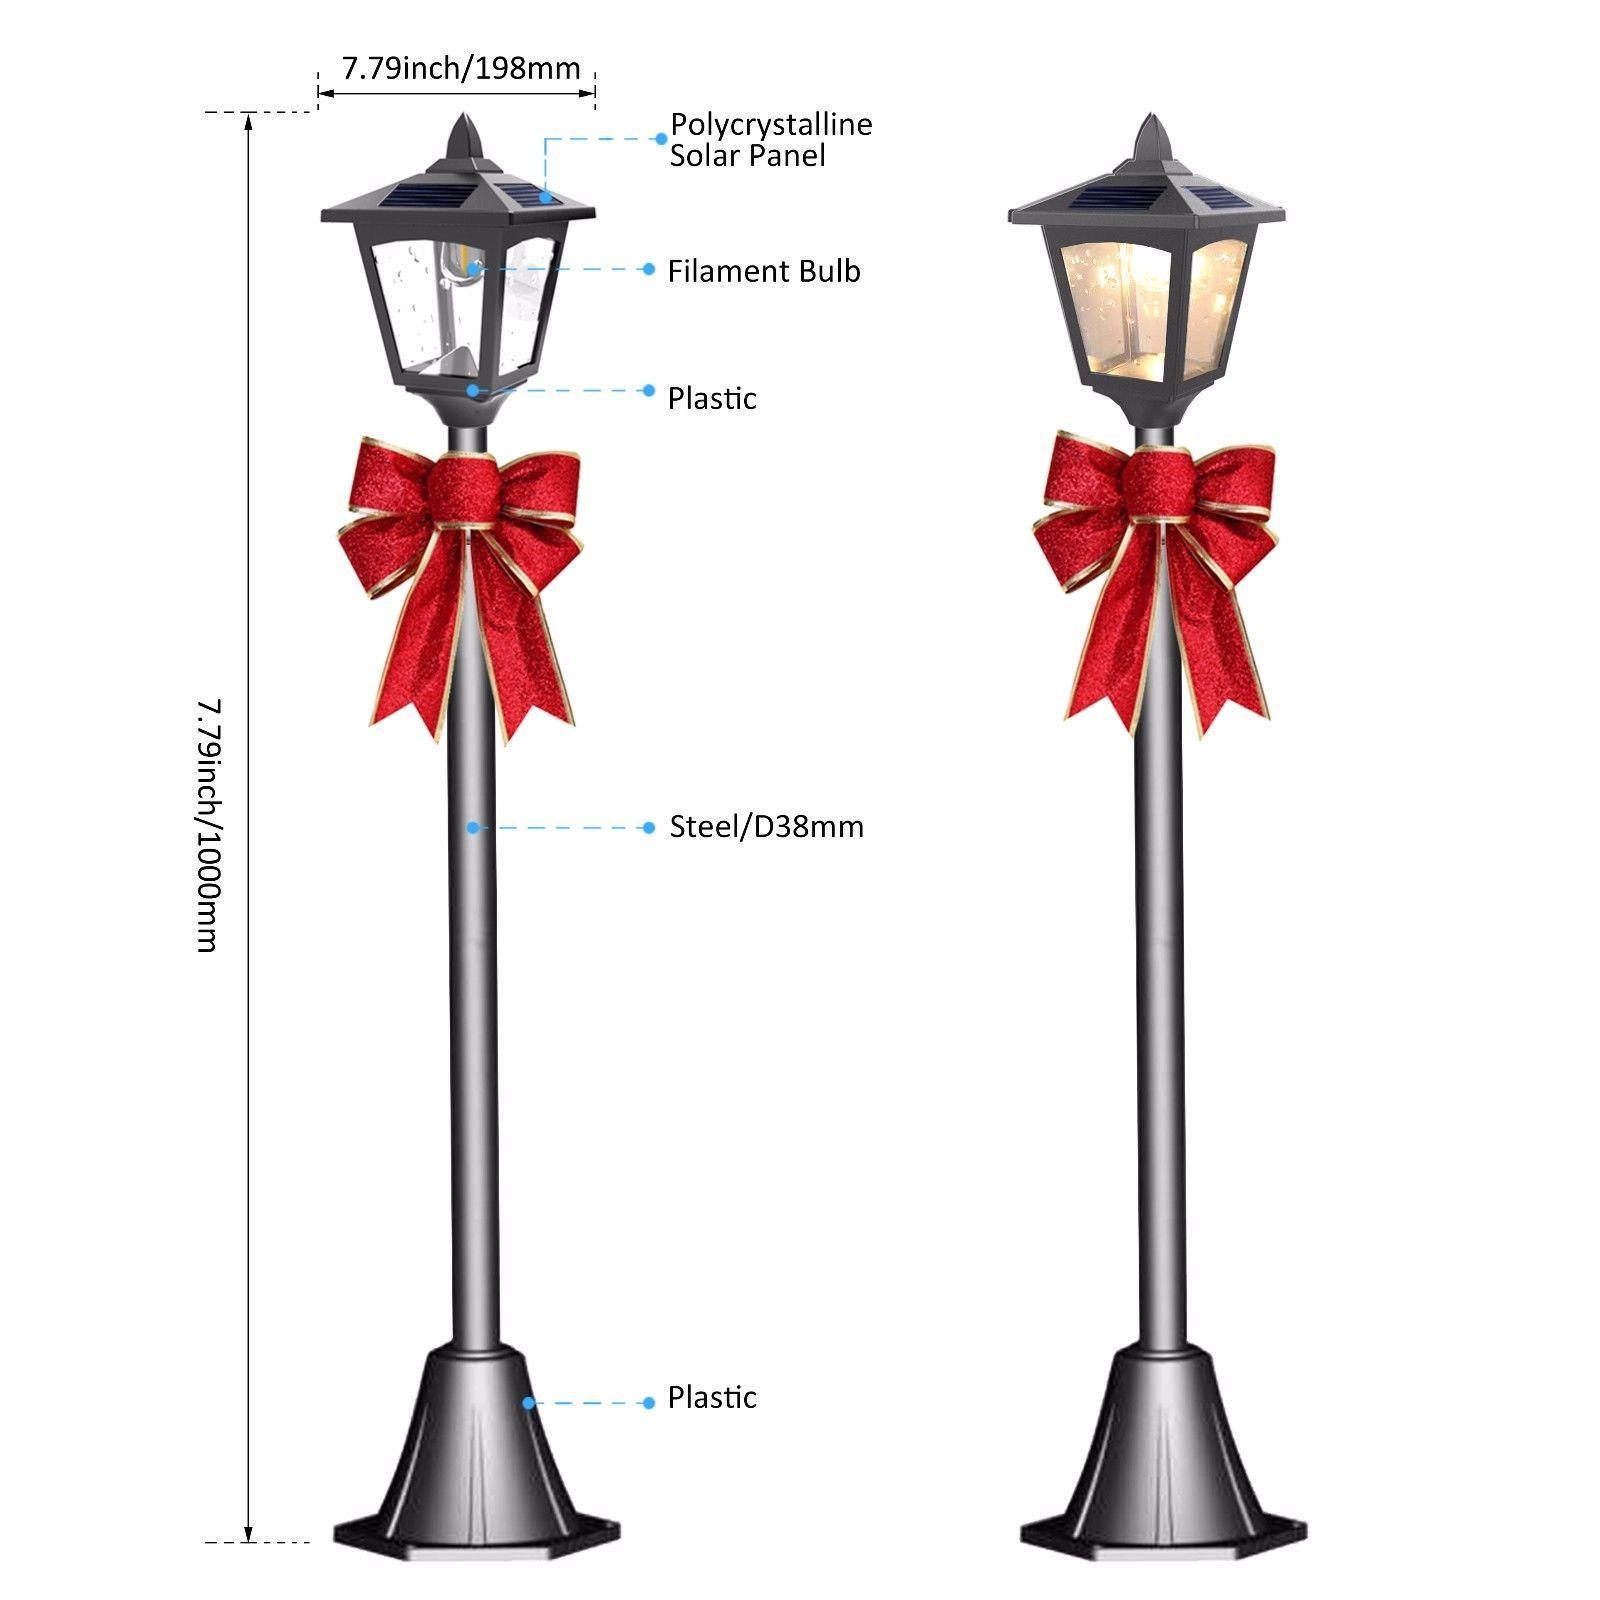 42 solar power christmas mini street vintage lamp post light for 42 solar power christmas mini street vintage lamp post light for outdoor garden 4998 httpstoresebaymyfuncorp aloadofball Image collections